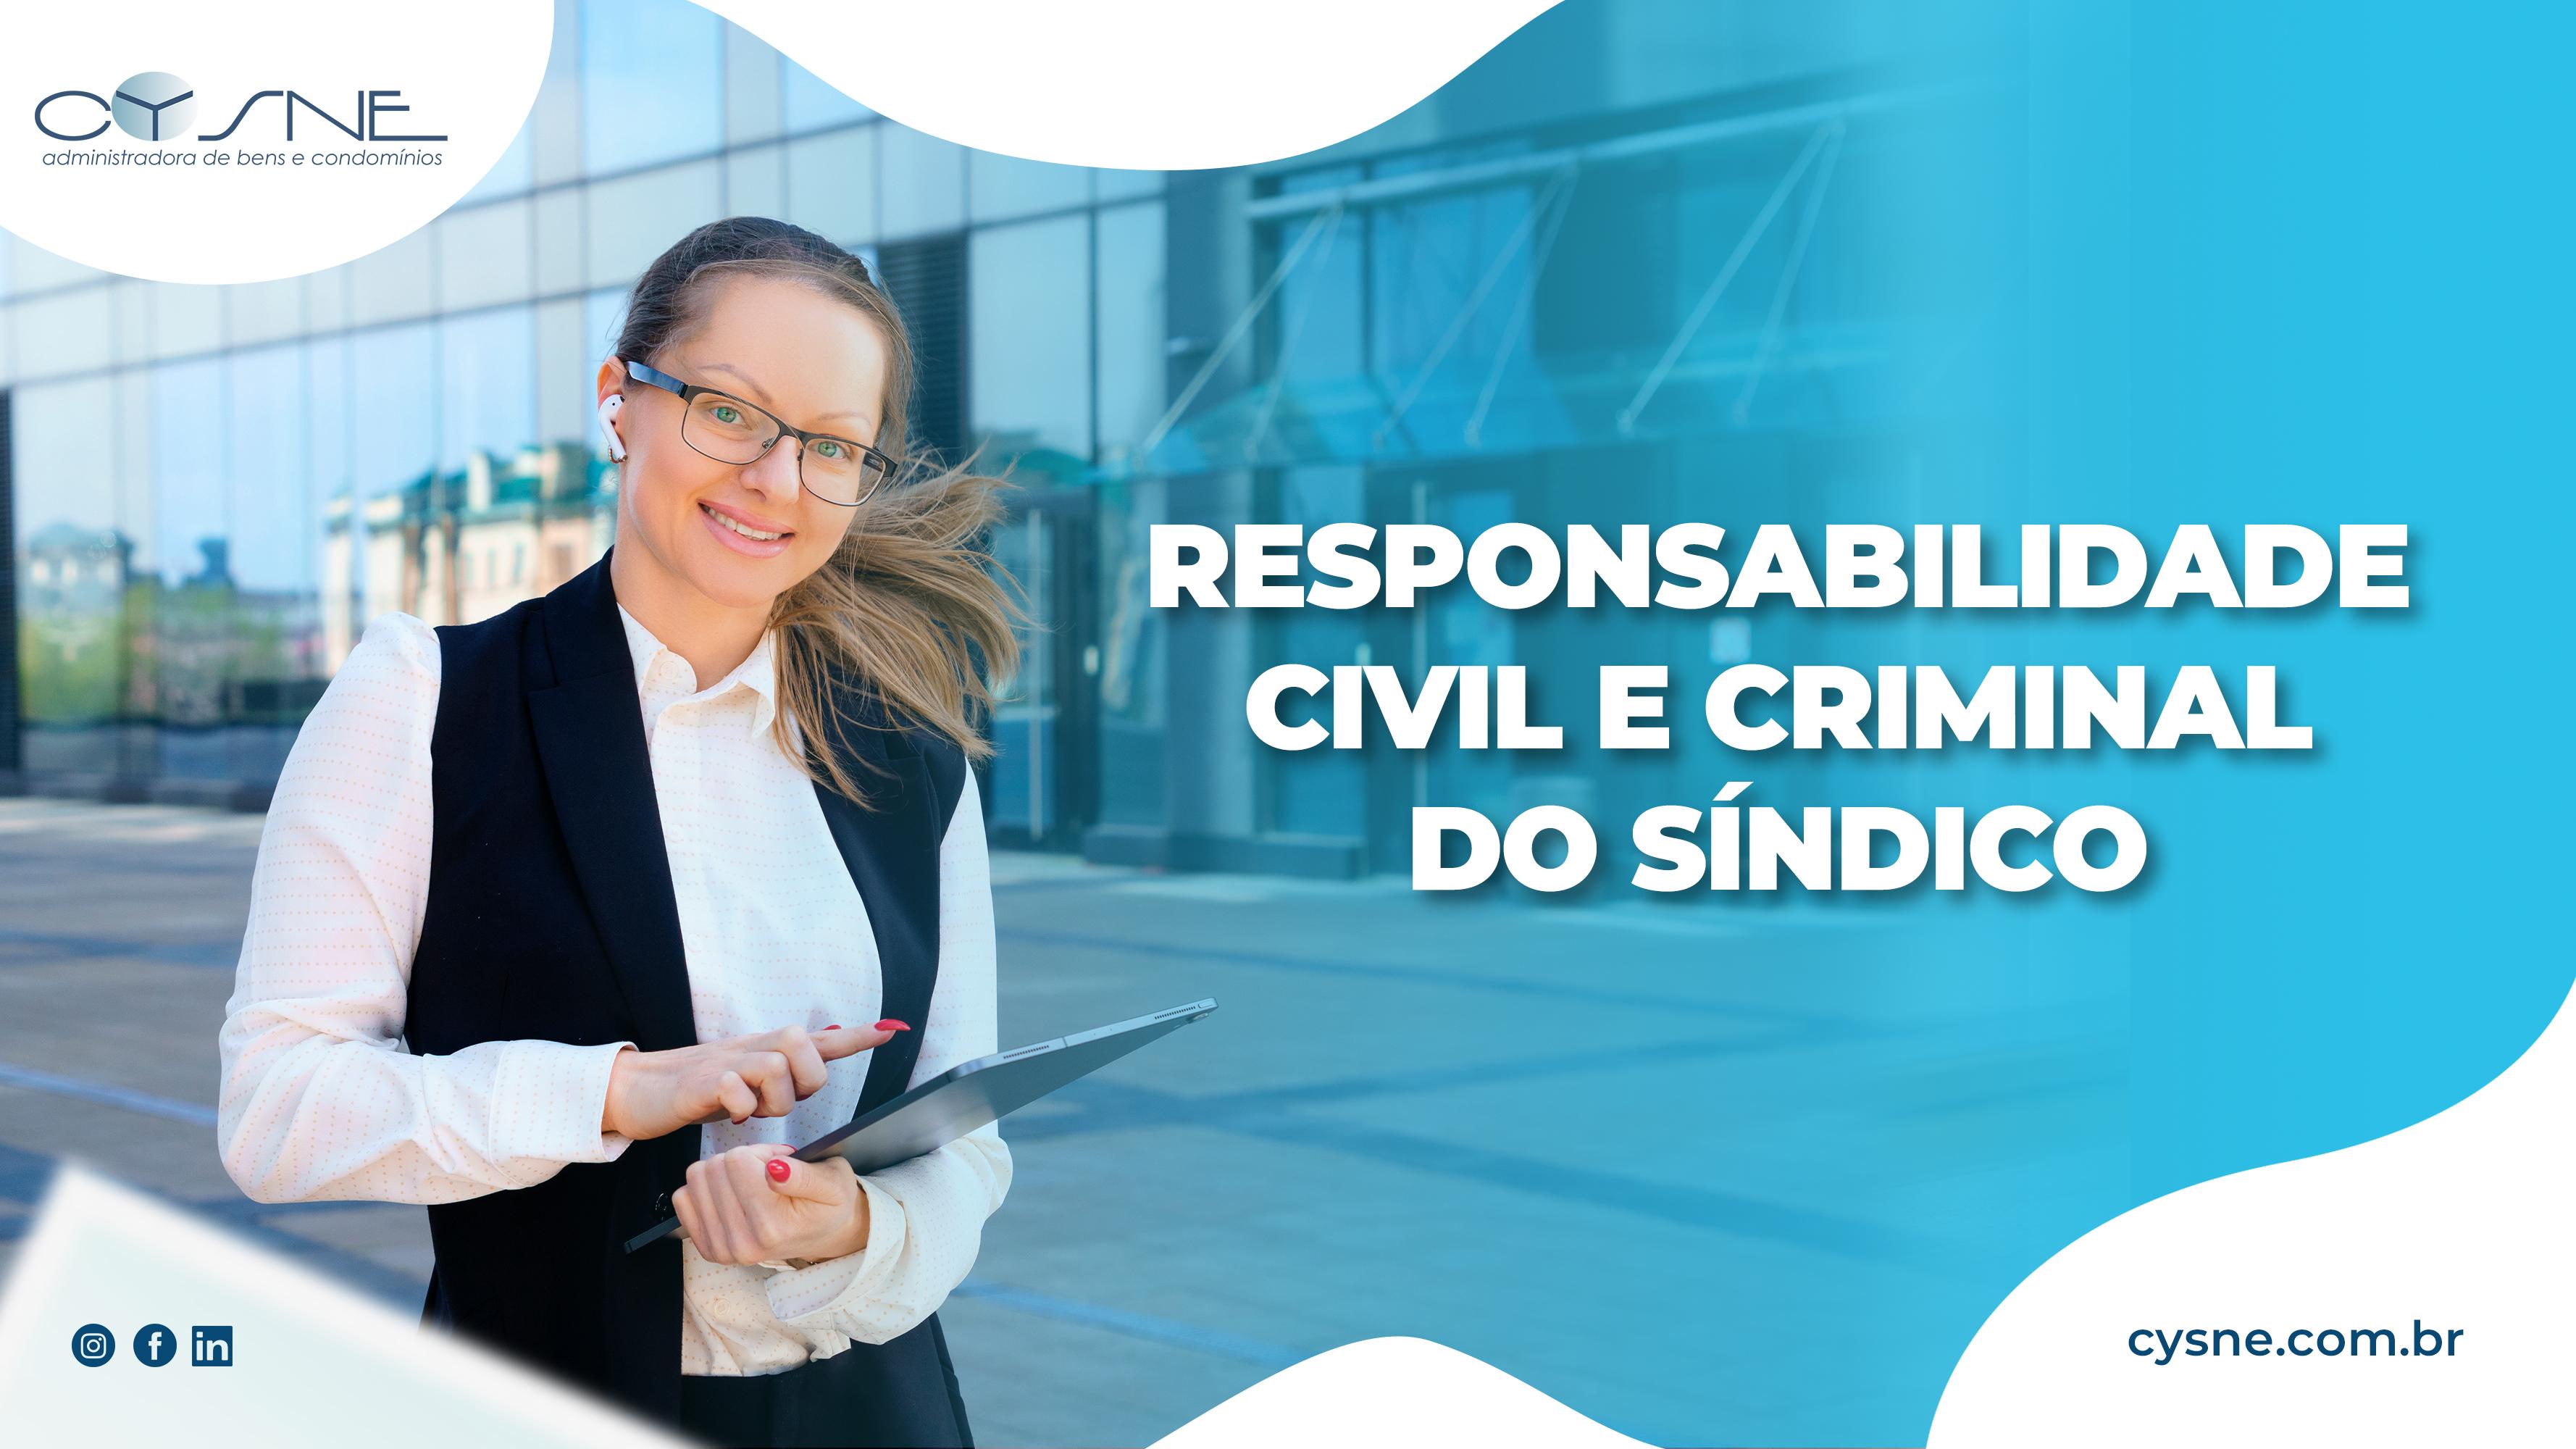 Responsabilidade Civil E Criminal - Cysne Administradora de bens e Condomínios